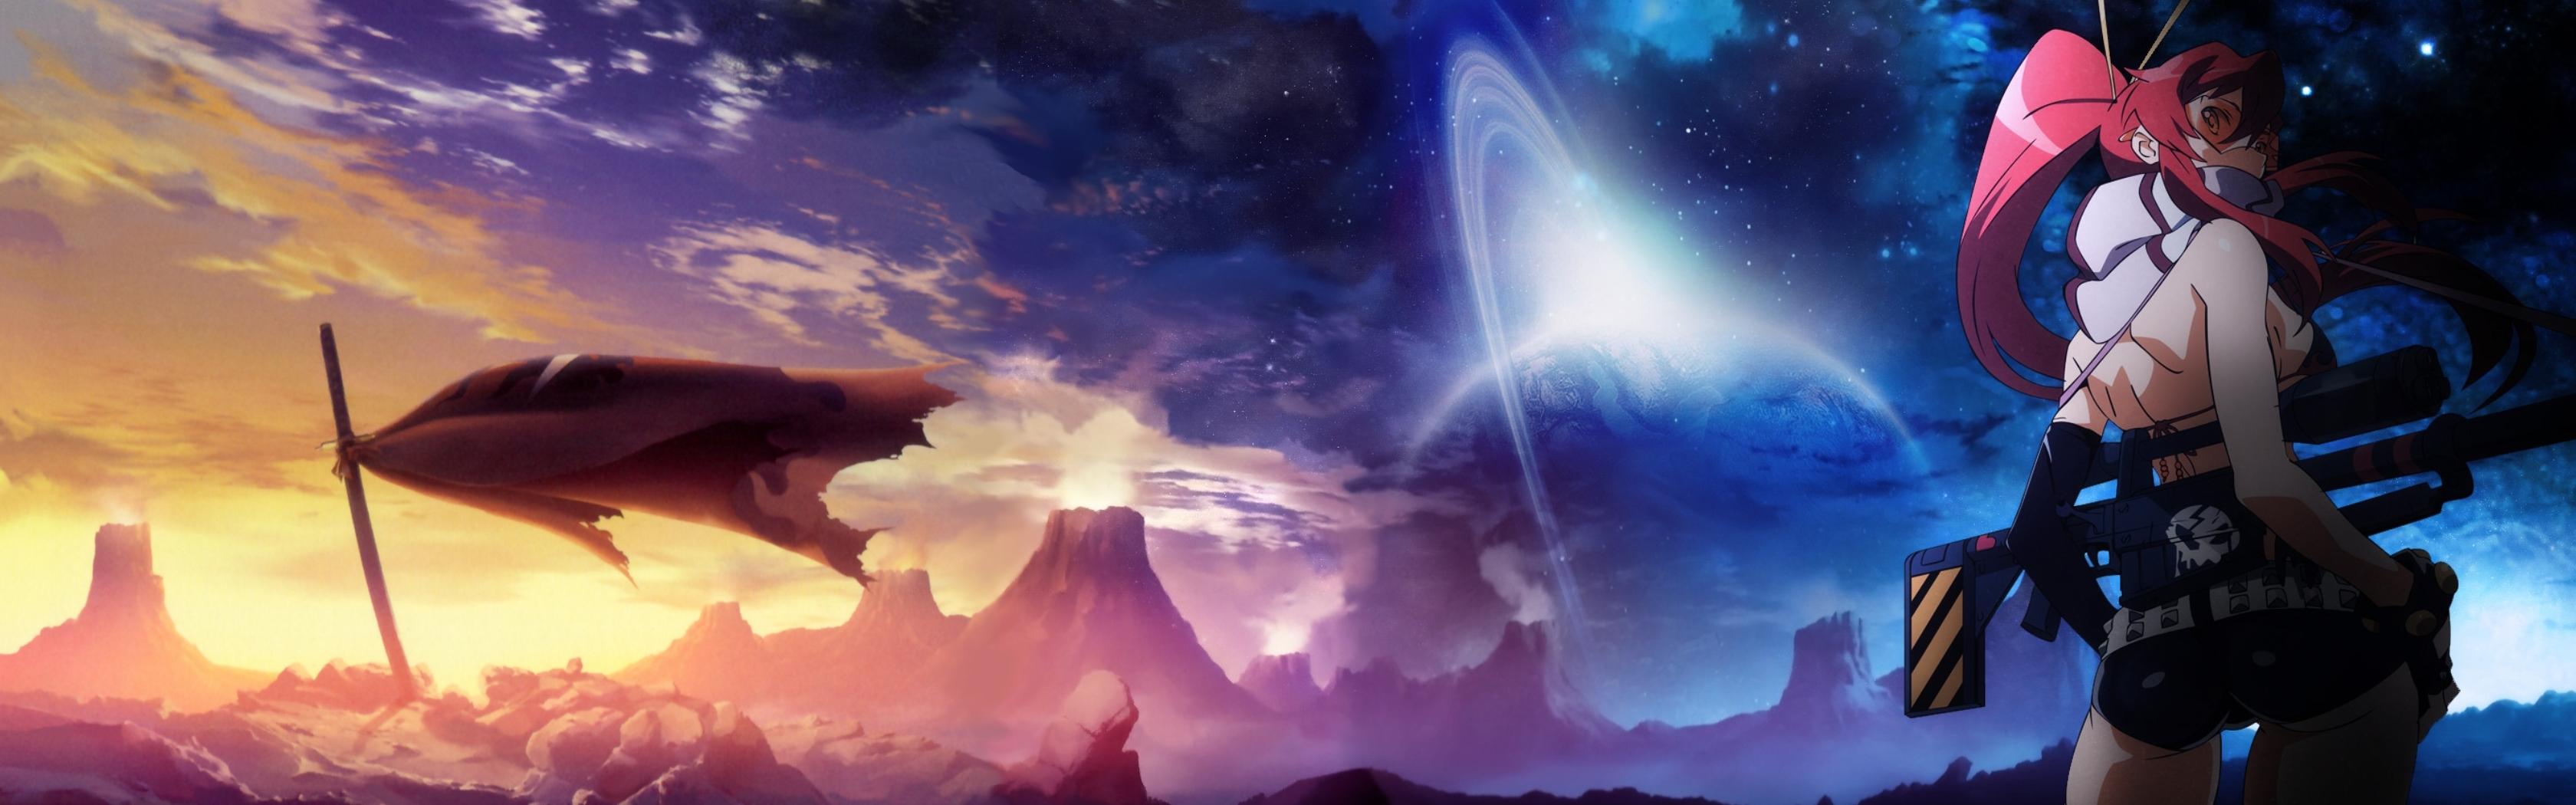 Cool Gravity Falls Wallpapers Tengen Toppa Gurren Lagann Wallpaper And Background Image